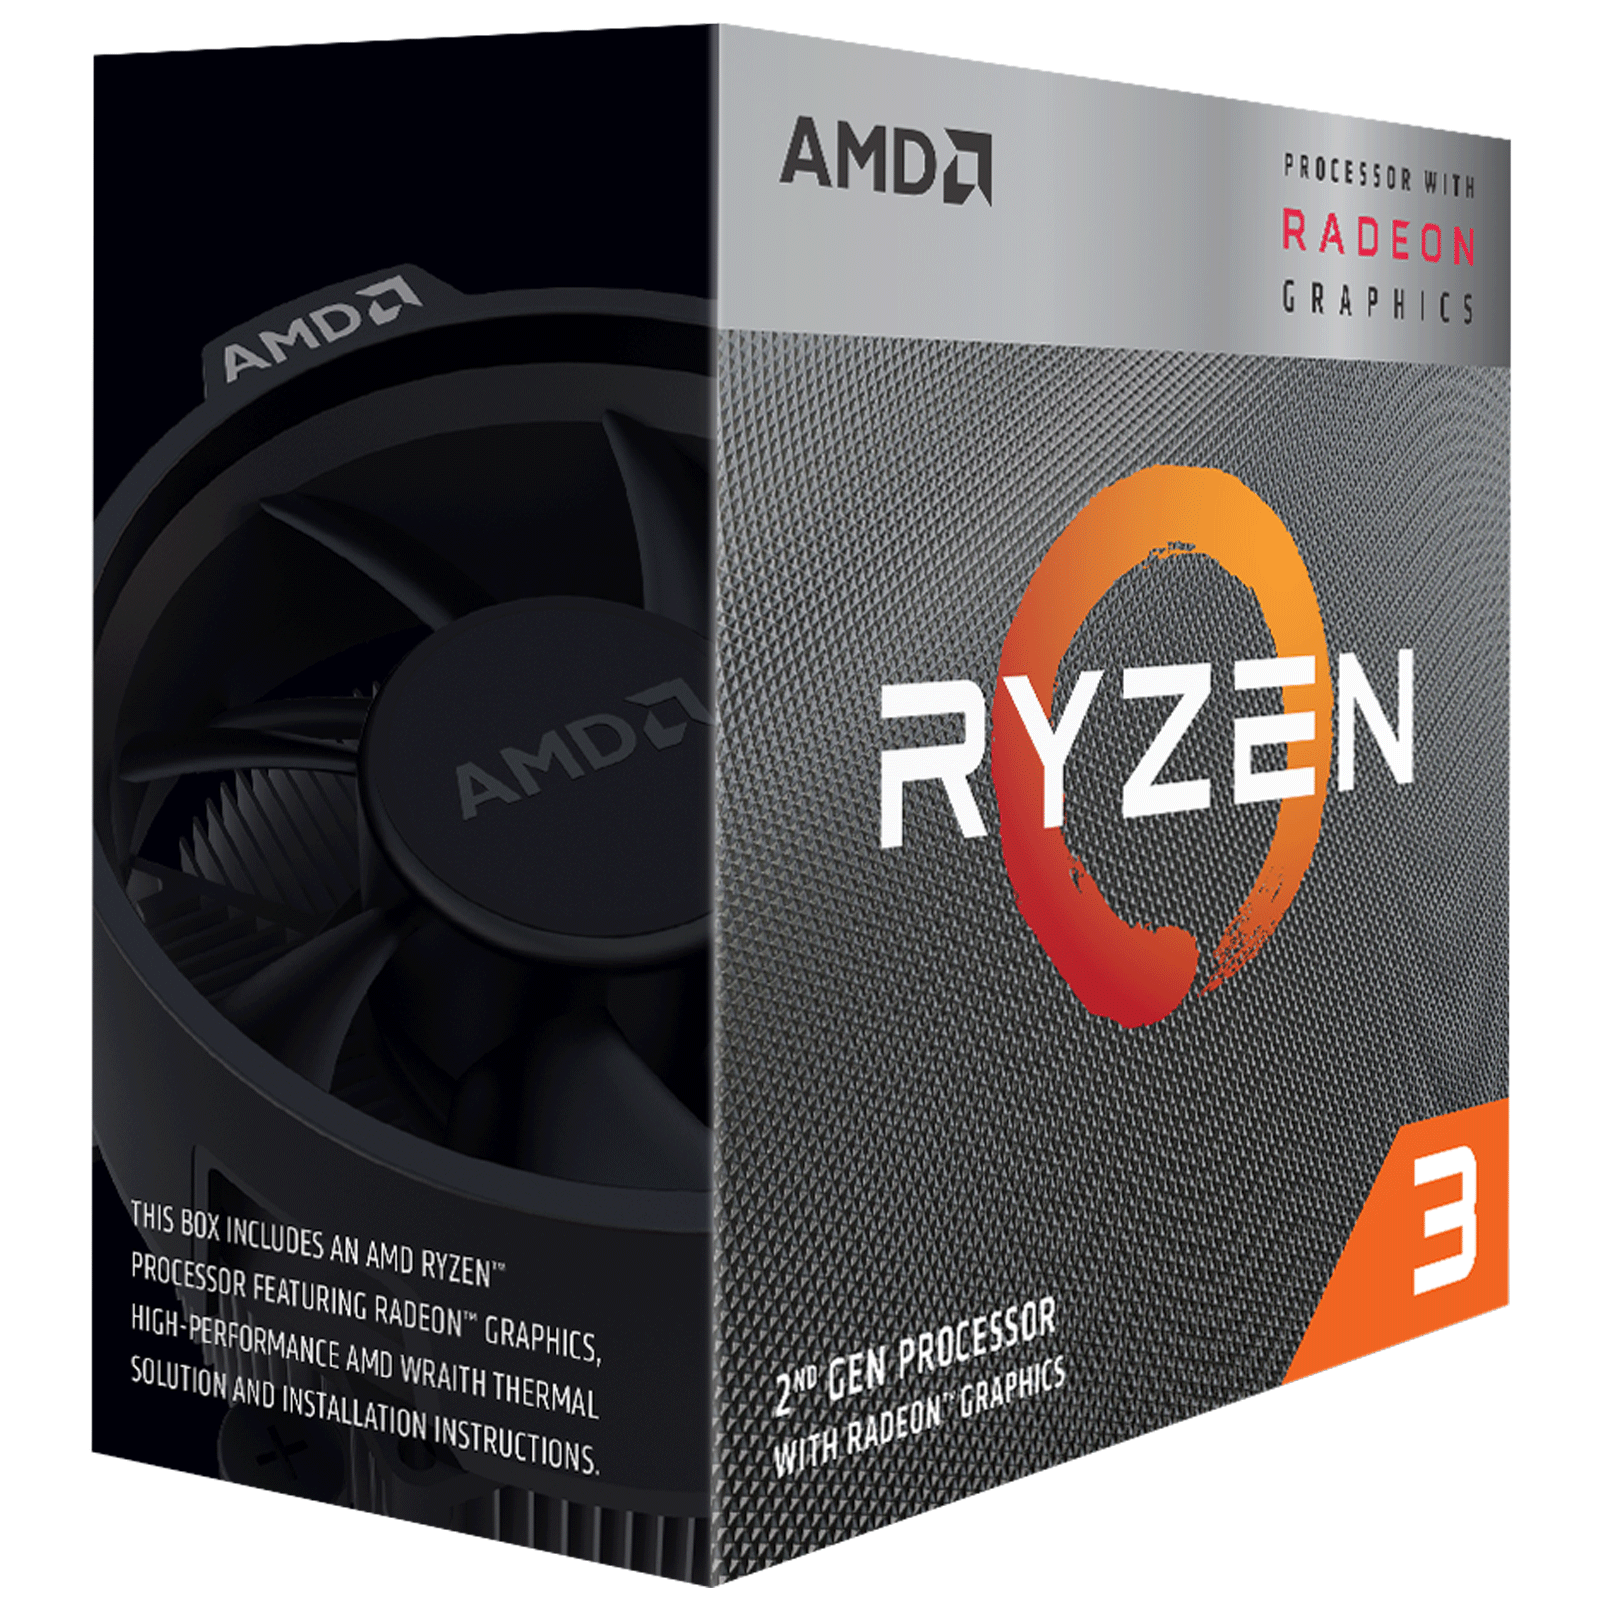 AMD Ryzen 3 Desktop Processor (4 Cores, 3.6 GHz, Radeon Vega 8 Graphics, 3200G, Silver)_1